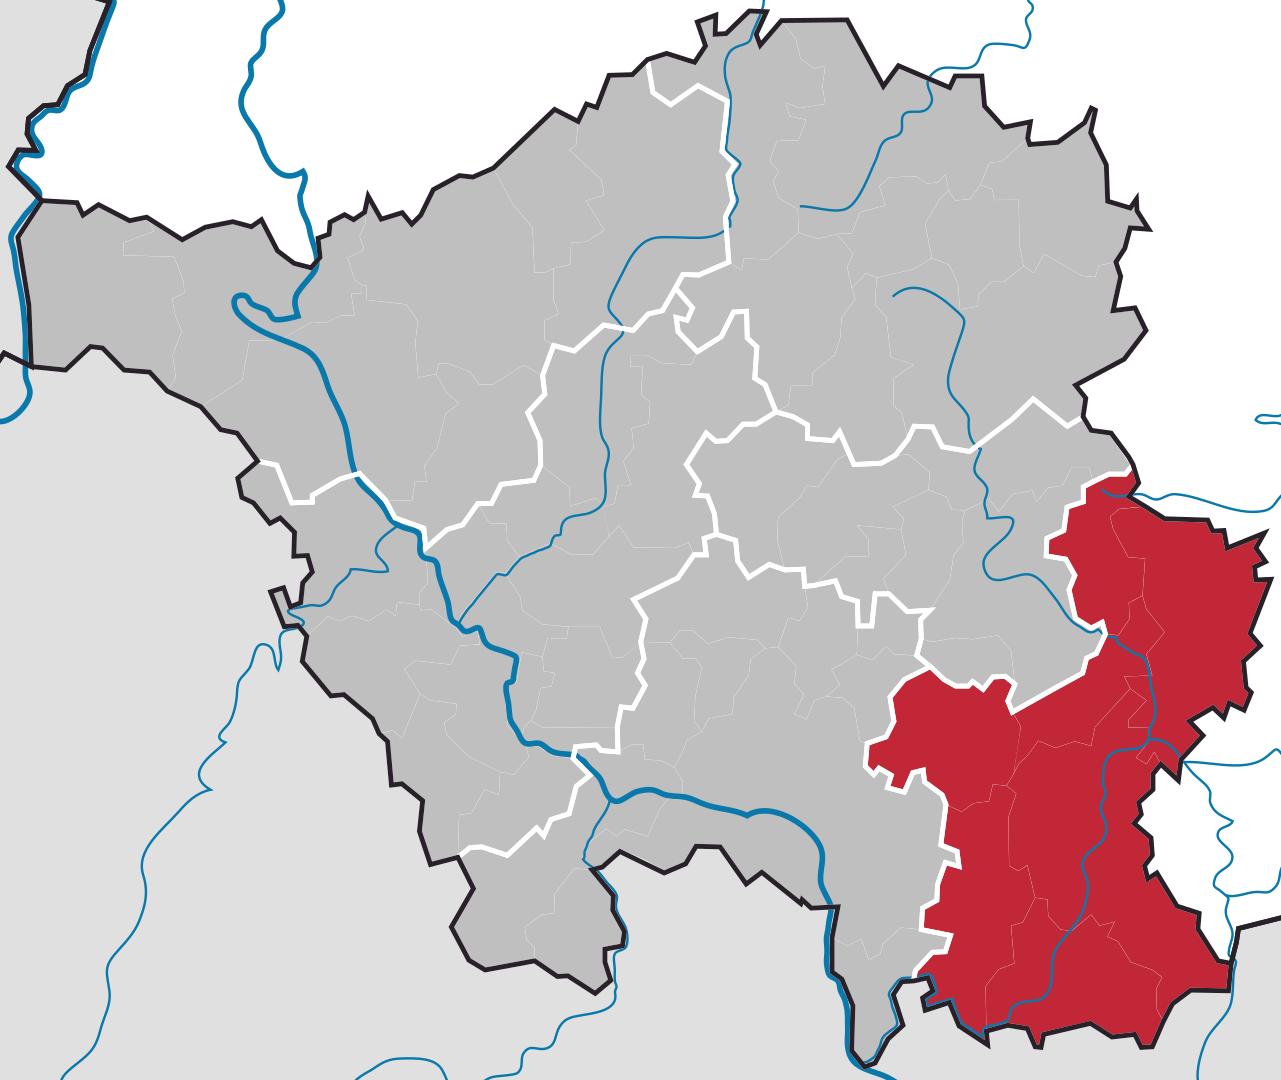 LK_Homburg_St_Ingbert_Saar-Pfalz